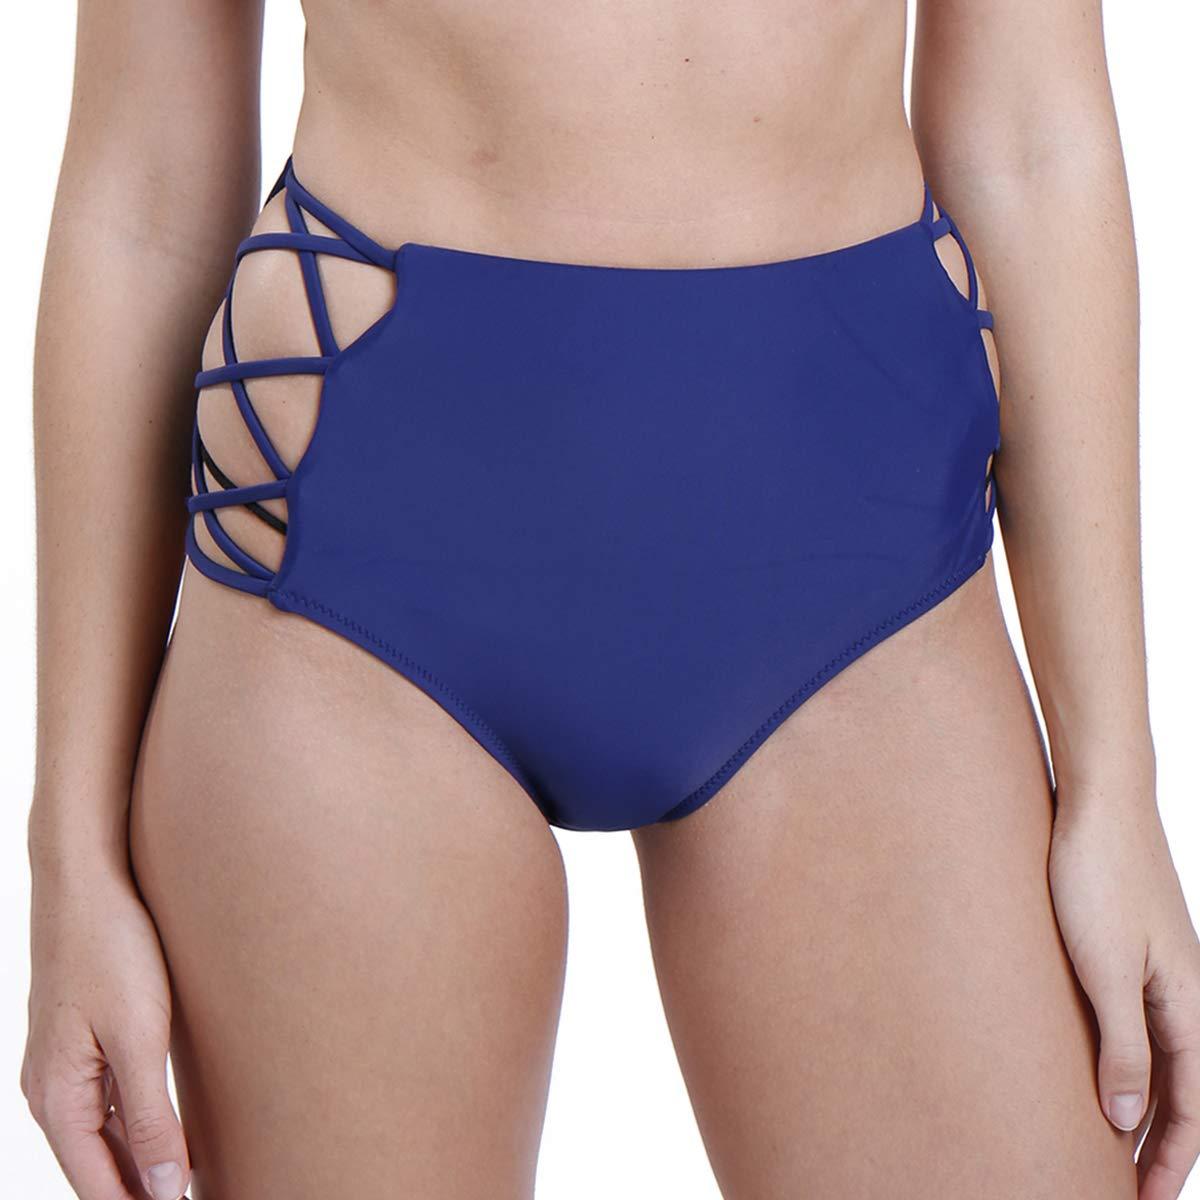 STARBILD Women Sexy High Waisted Bikini Bottoms Strappy Sides Retro Bathing Suit Underwear Swimsuit